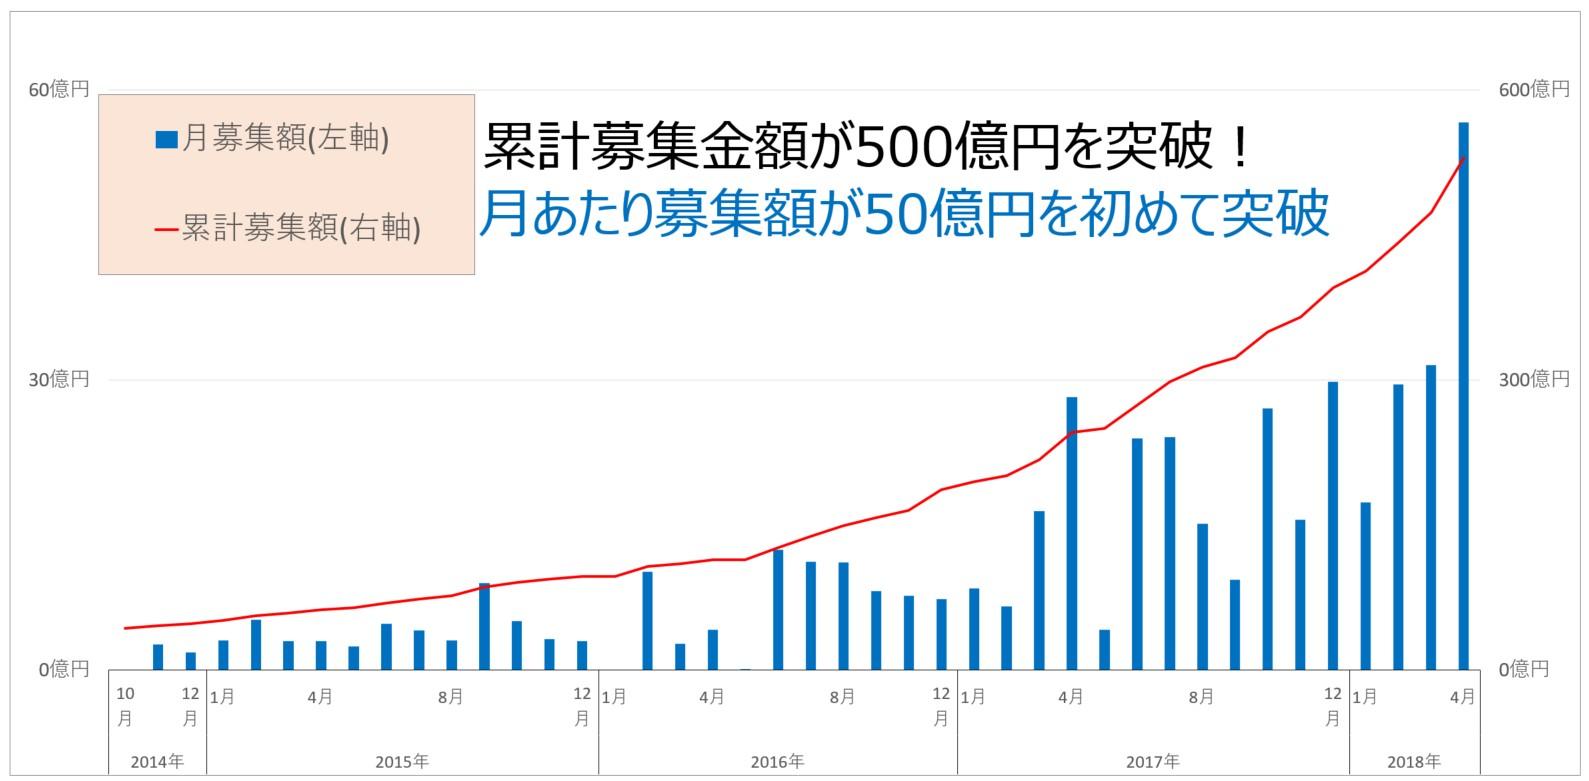 SBIソーシャルレンディング累計募集額500億円突破!